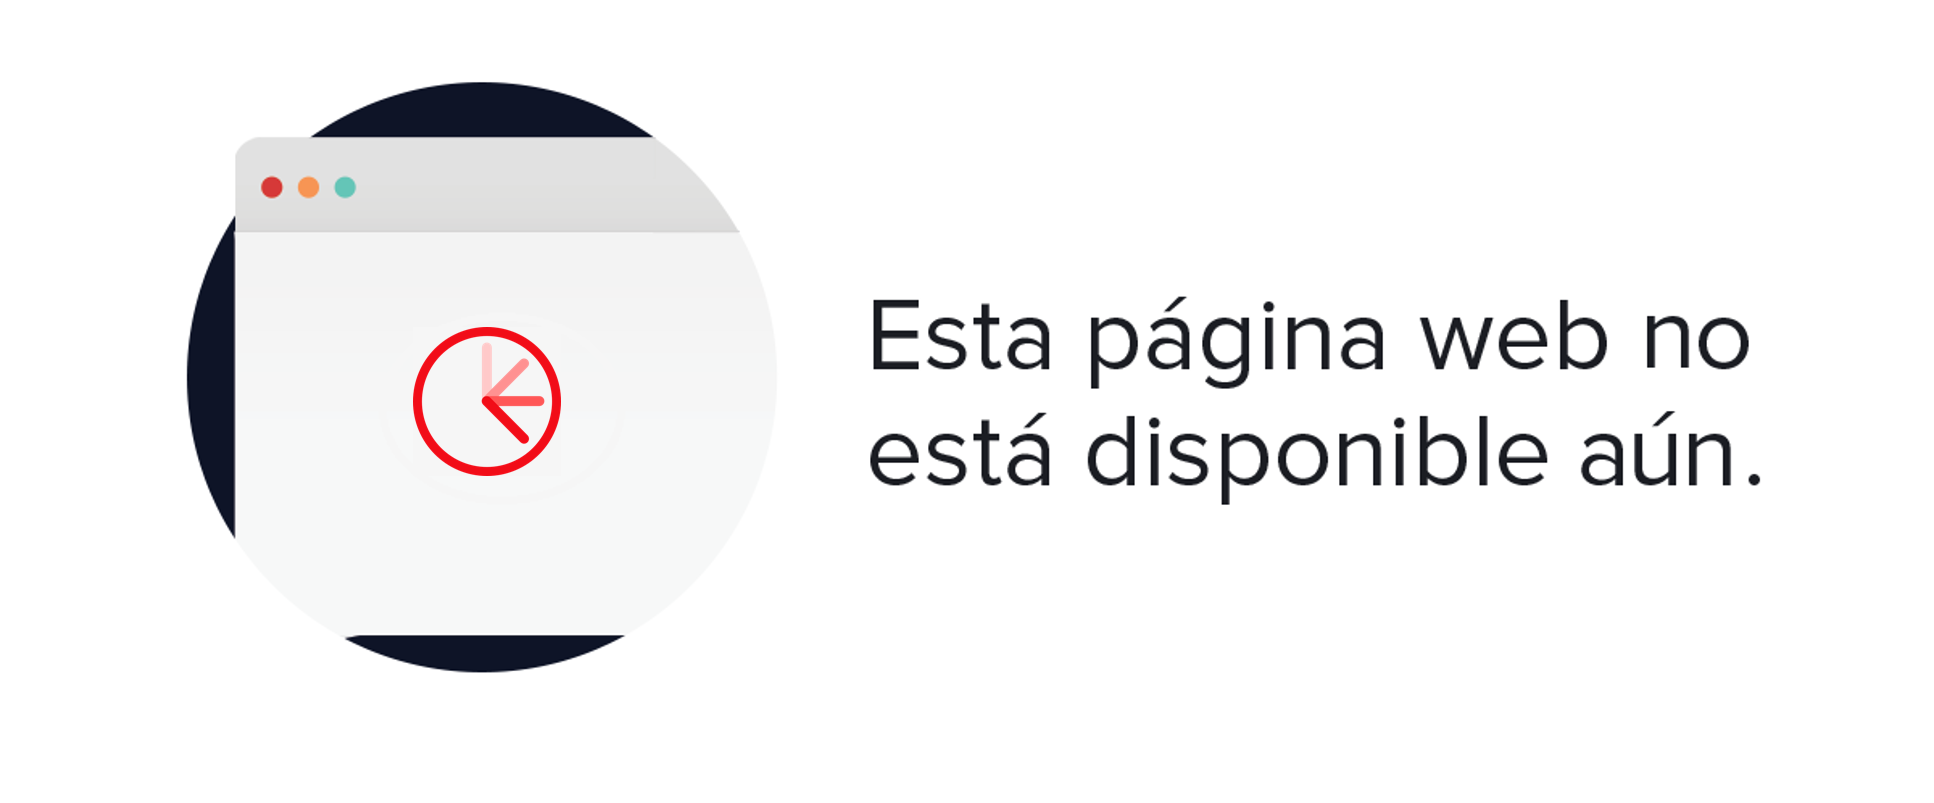 Zapatillas para mujer Zapatillas para mujer Maculato+tejus+vernice beig Candice Cooper beige 5KSjmQgy